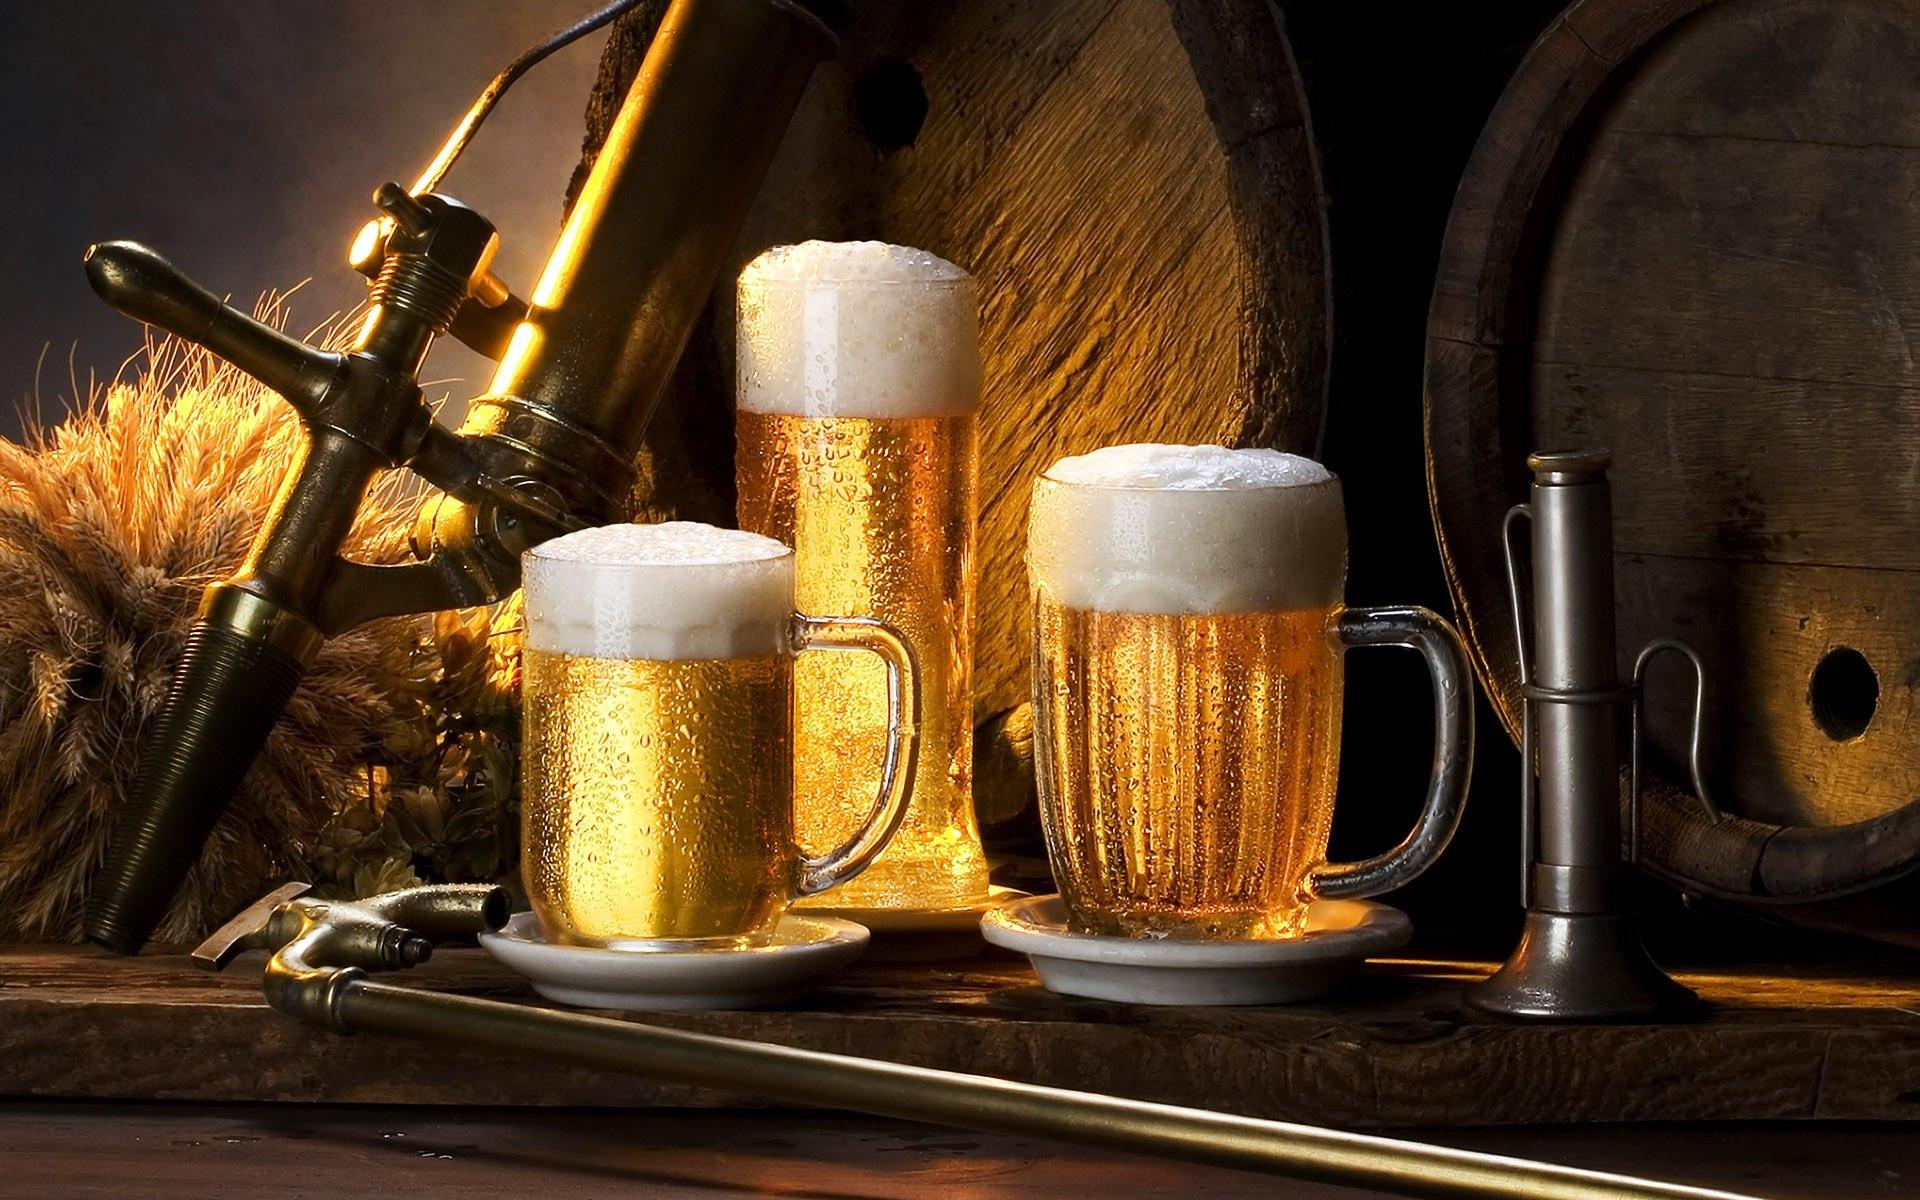 https://ekaenlinea.com/wp-content/uploads/2016/09/Fondox.net_chops-de-cerveza_1920x1200.jpg